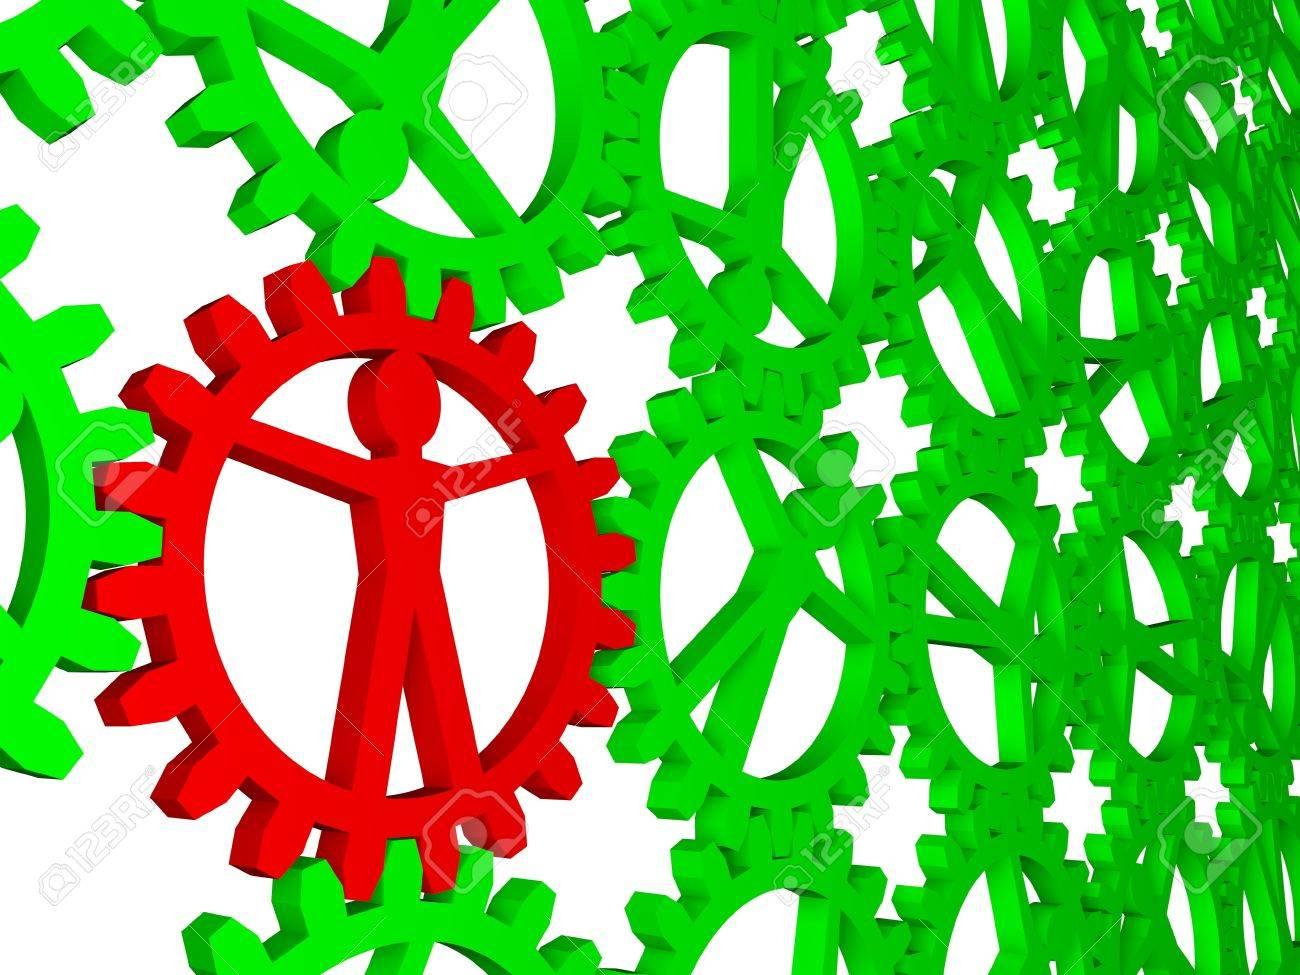 People like gears - company, work, individuality Stock Photo - 12995515